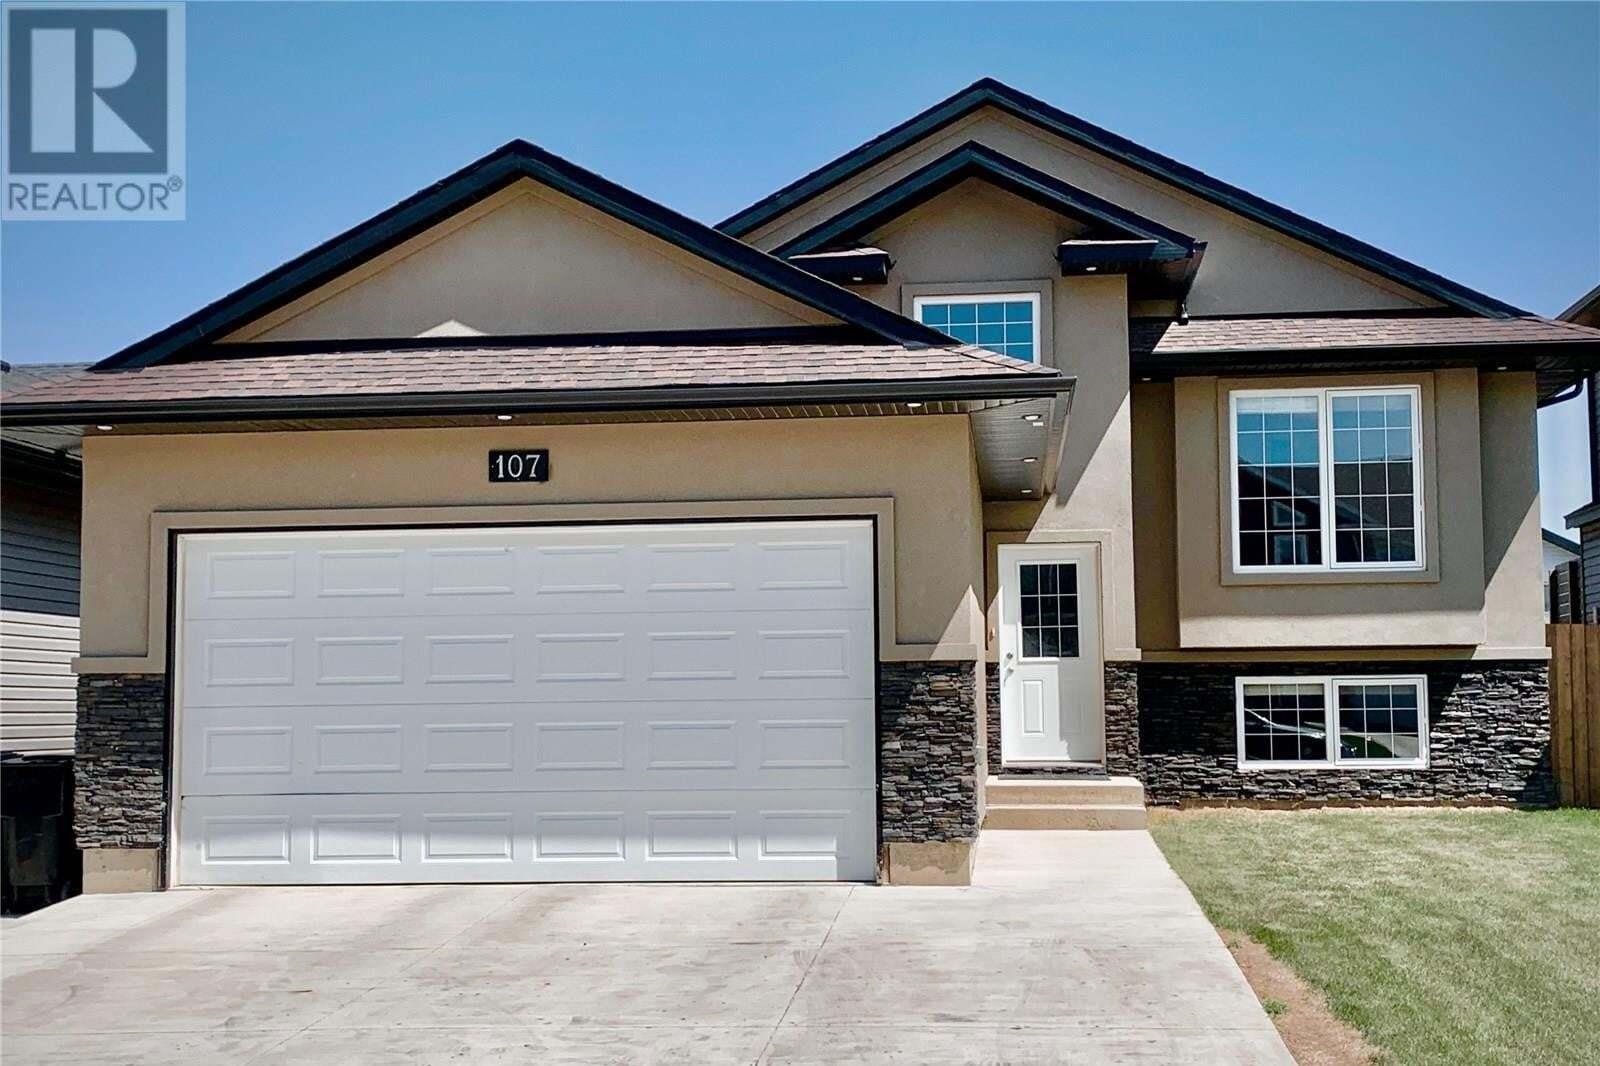 House for sale at 107 Atton Cres Saskatoon Saskatchewan - MLS: SK811014